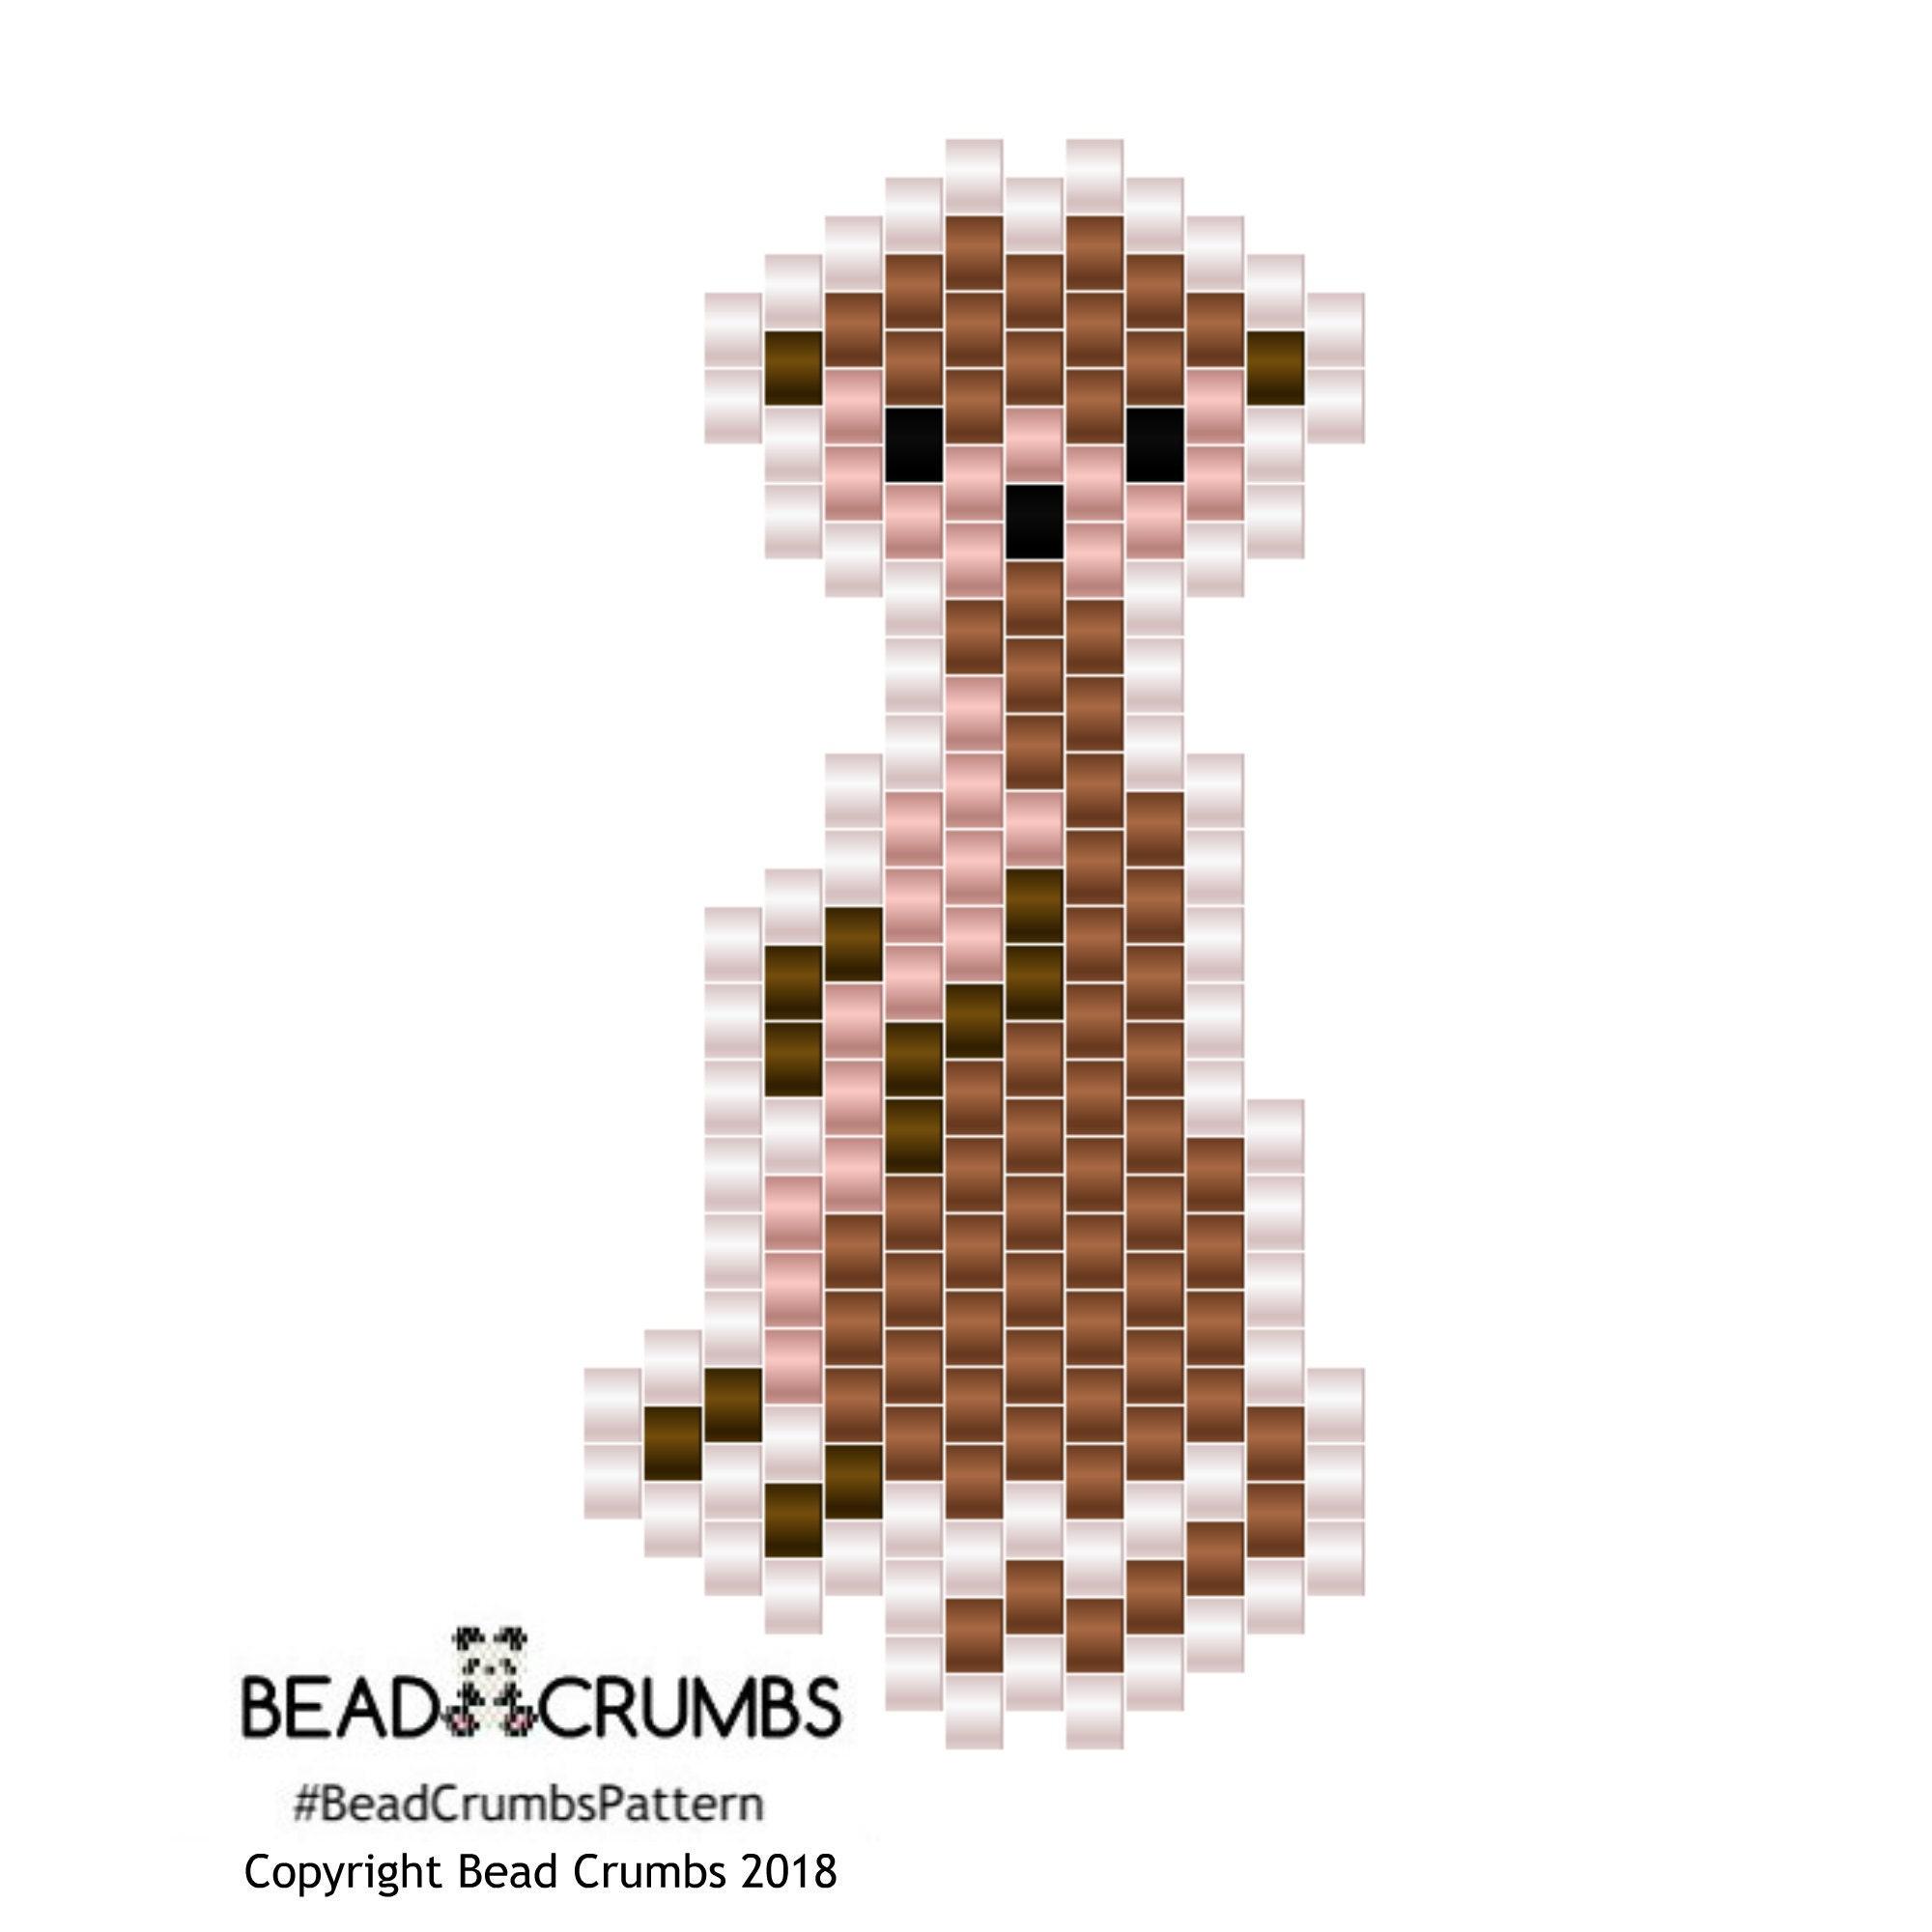 Brick Stitch Meerkat Pattern by Bead Crumbs